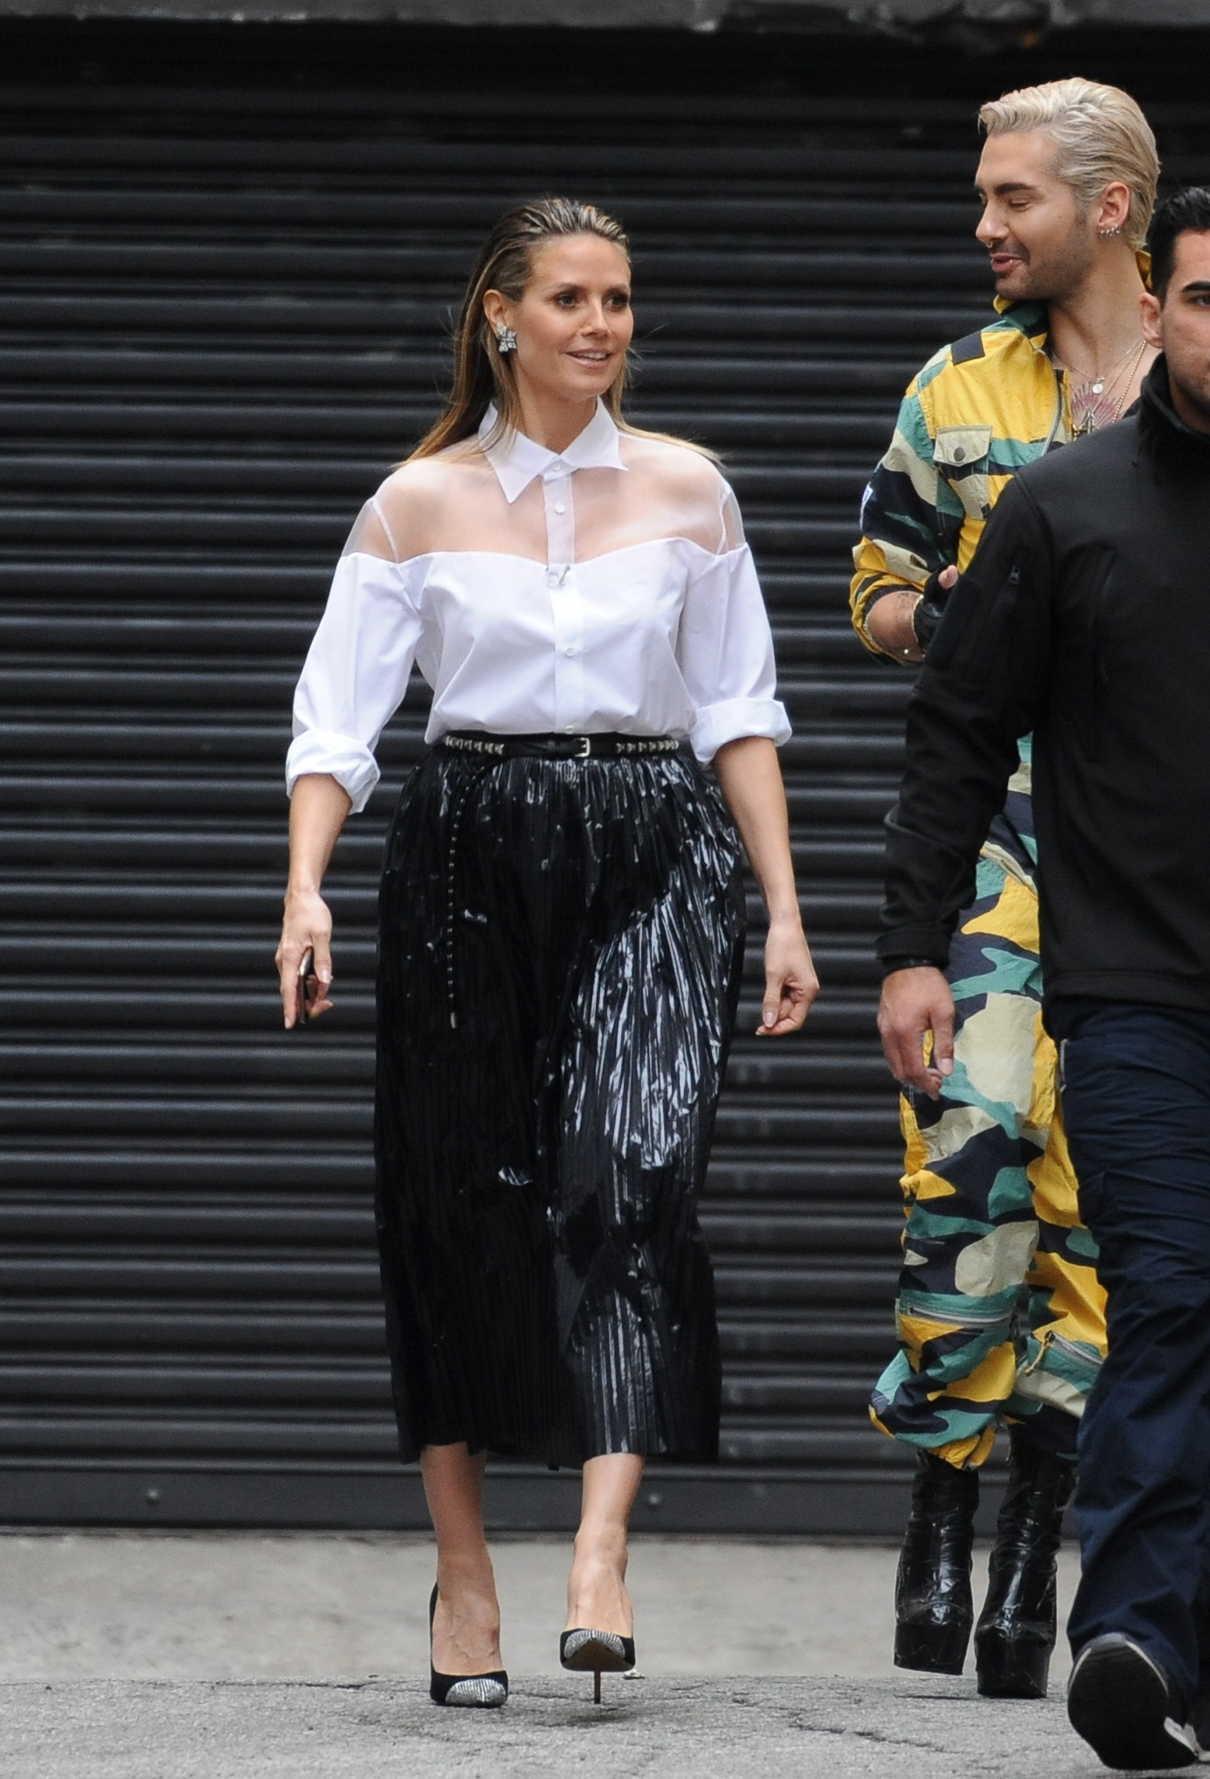 Heidi Klum in a White Blouse